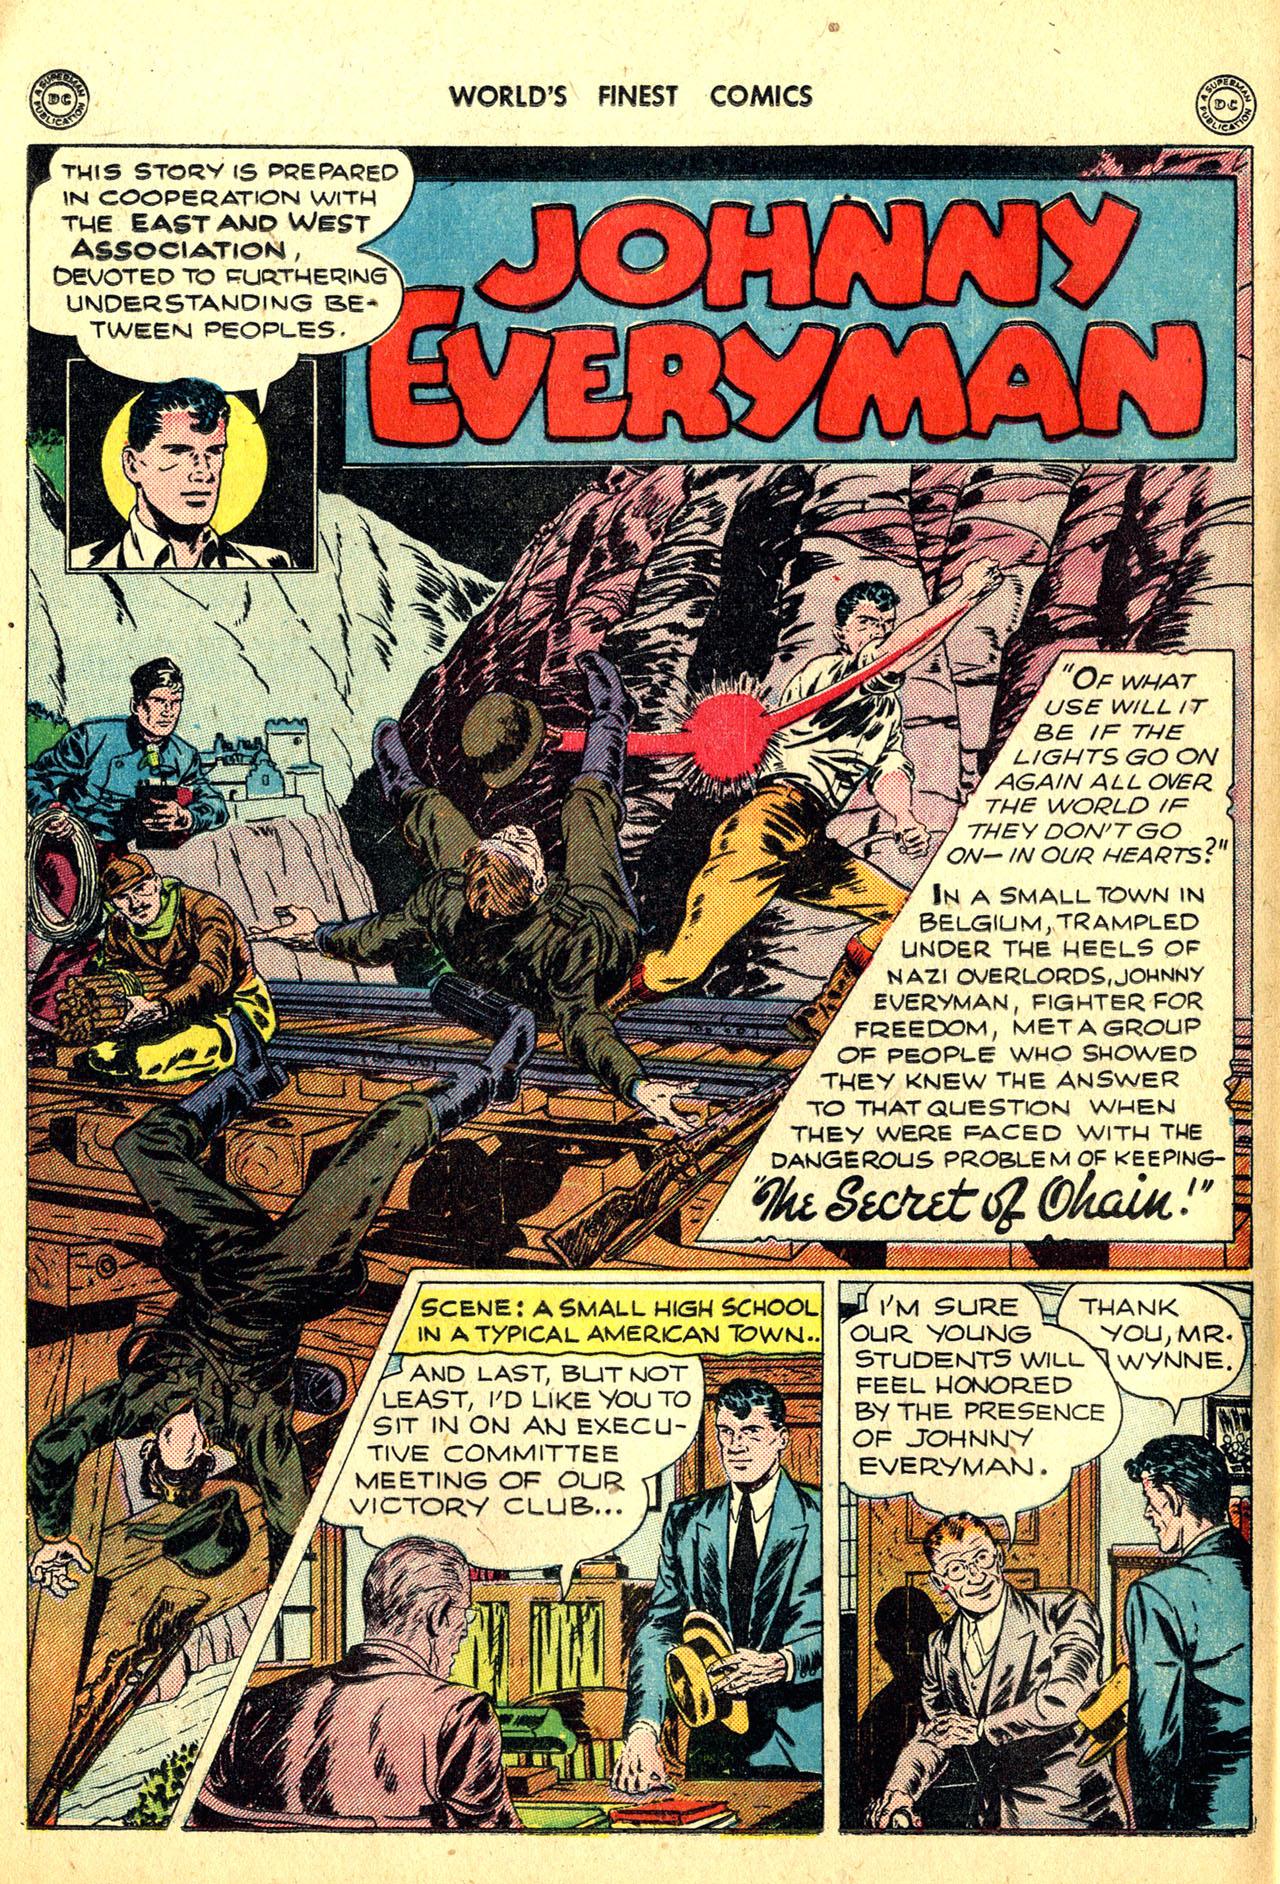 Read online World's Finest Comics comic -  Issue #18 - 60